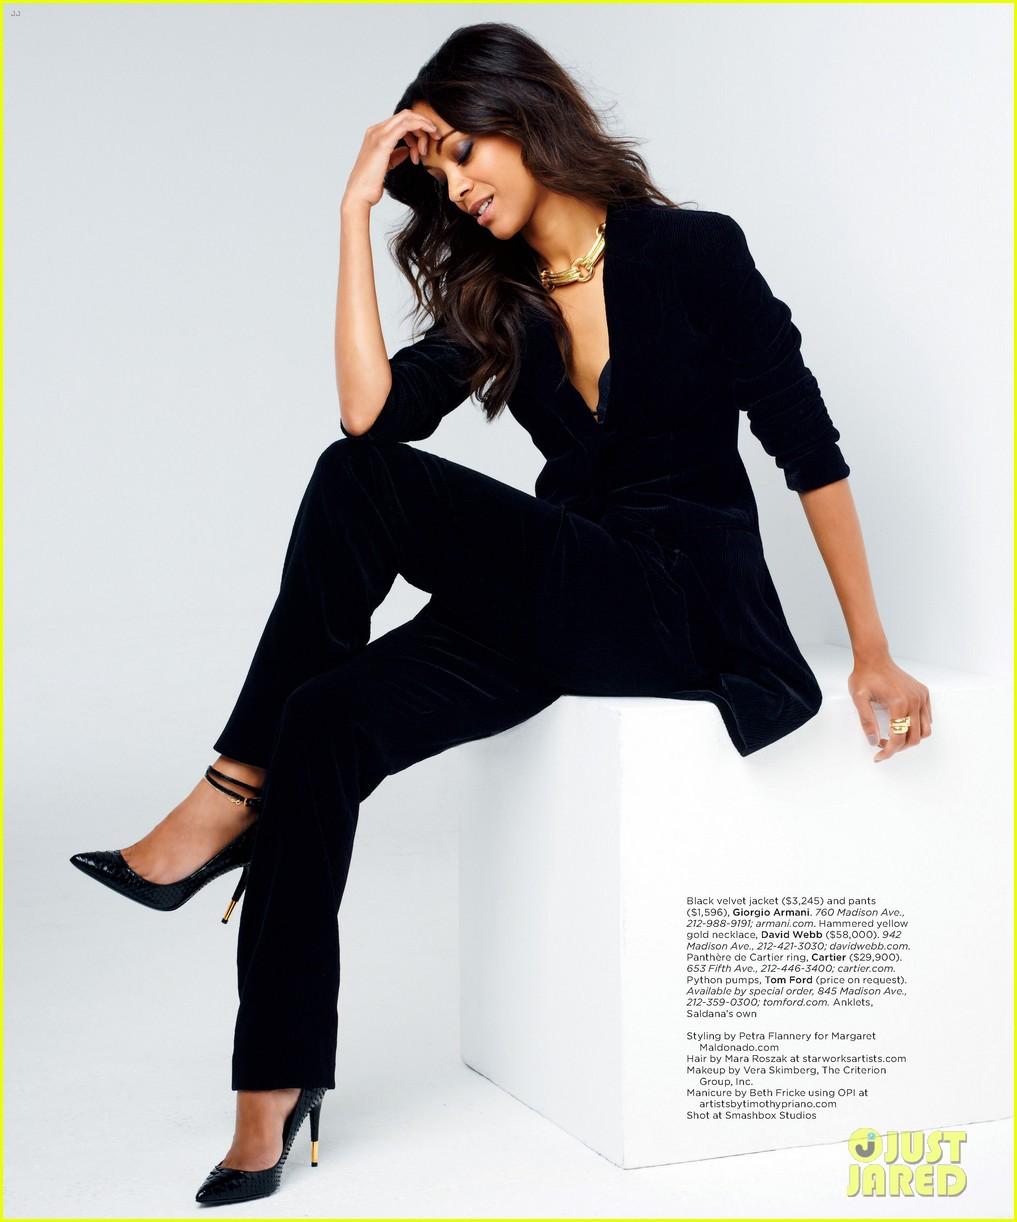 Zoe Saldana Covers Gotham Magazine September 2012 Photo